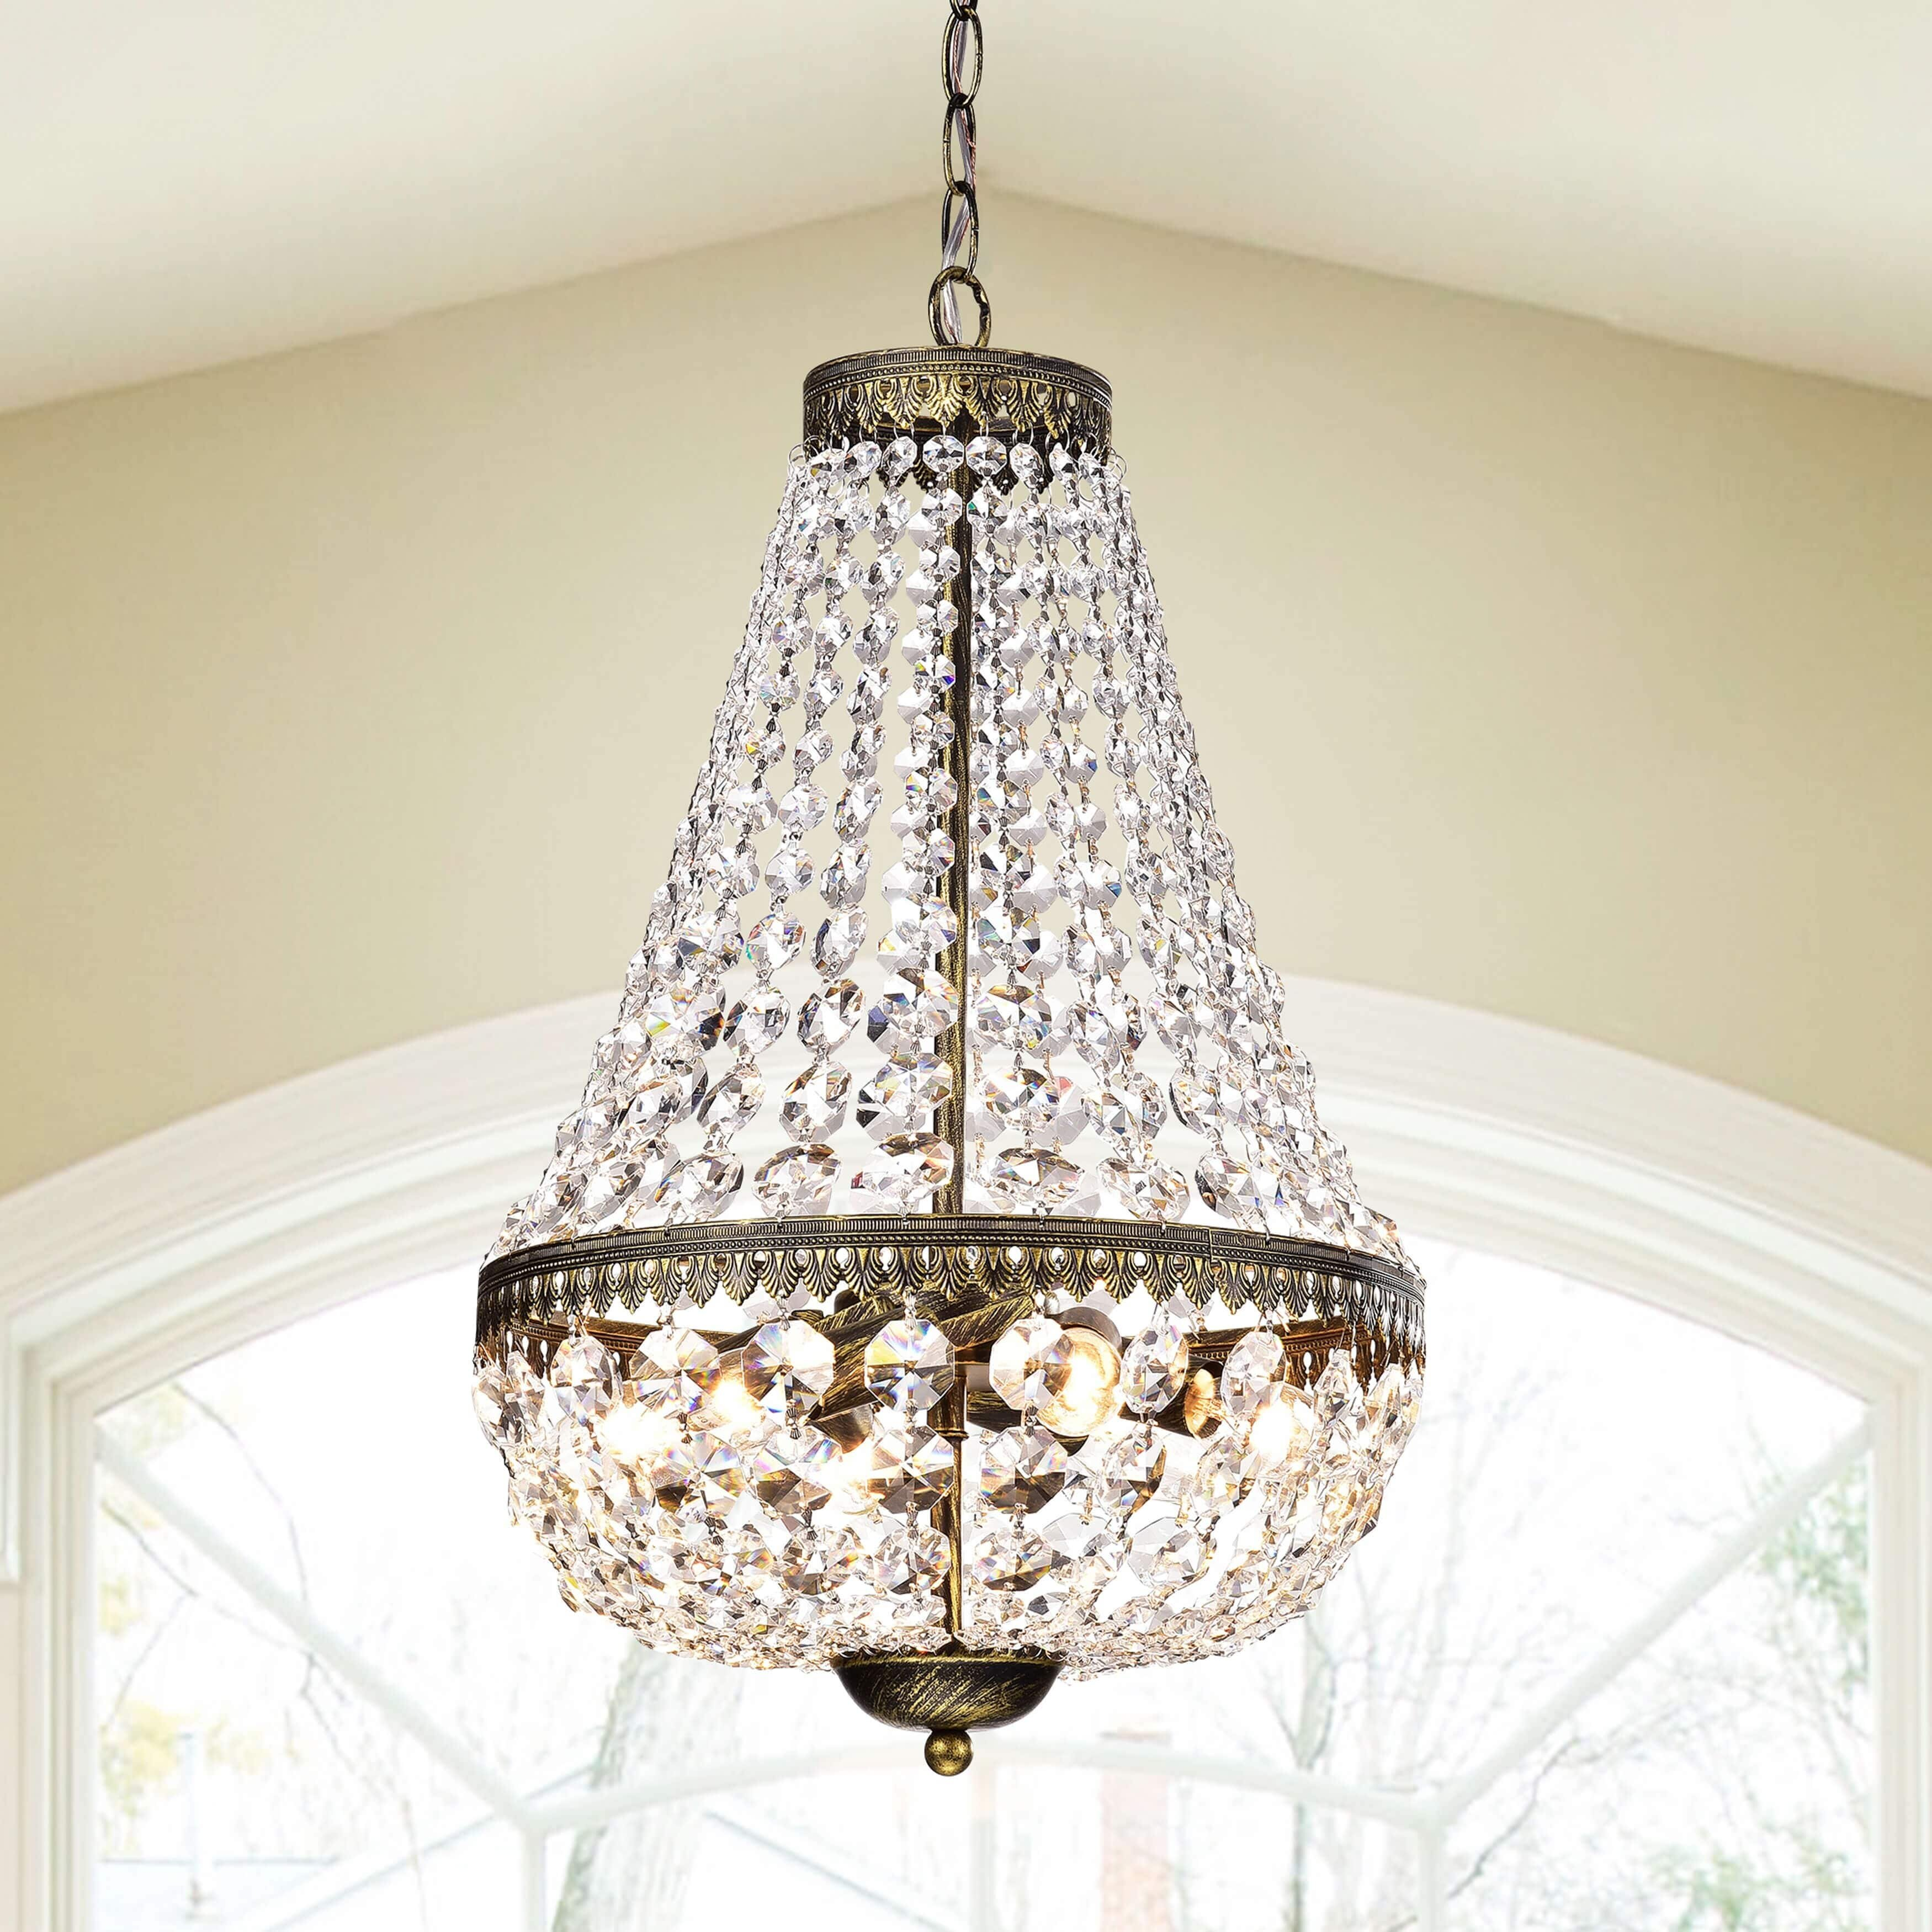 Astoria grand gartner symmetric 6 light crystal chandelier reviews wayfair